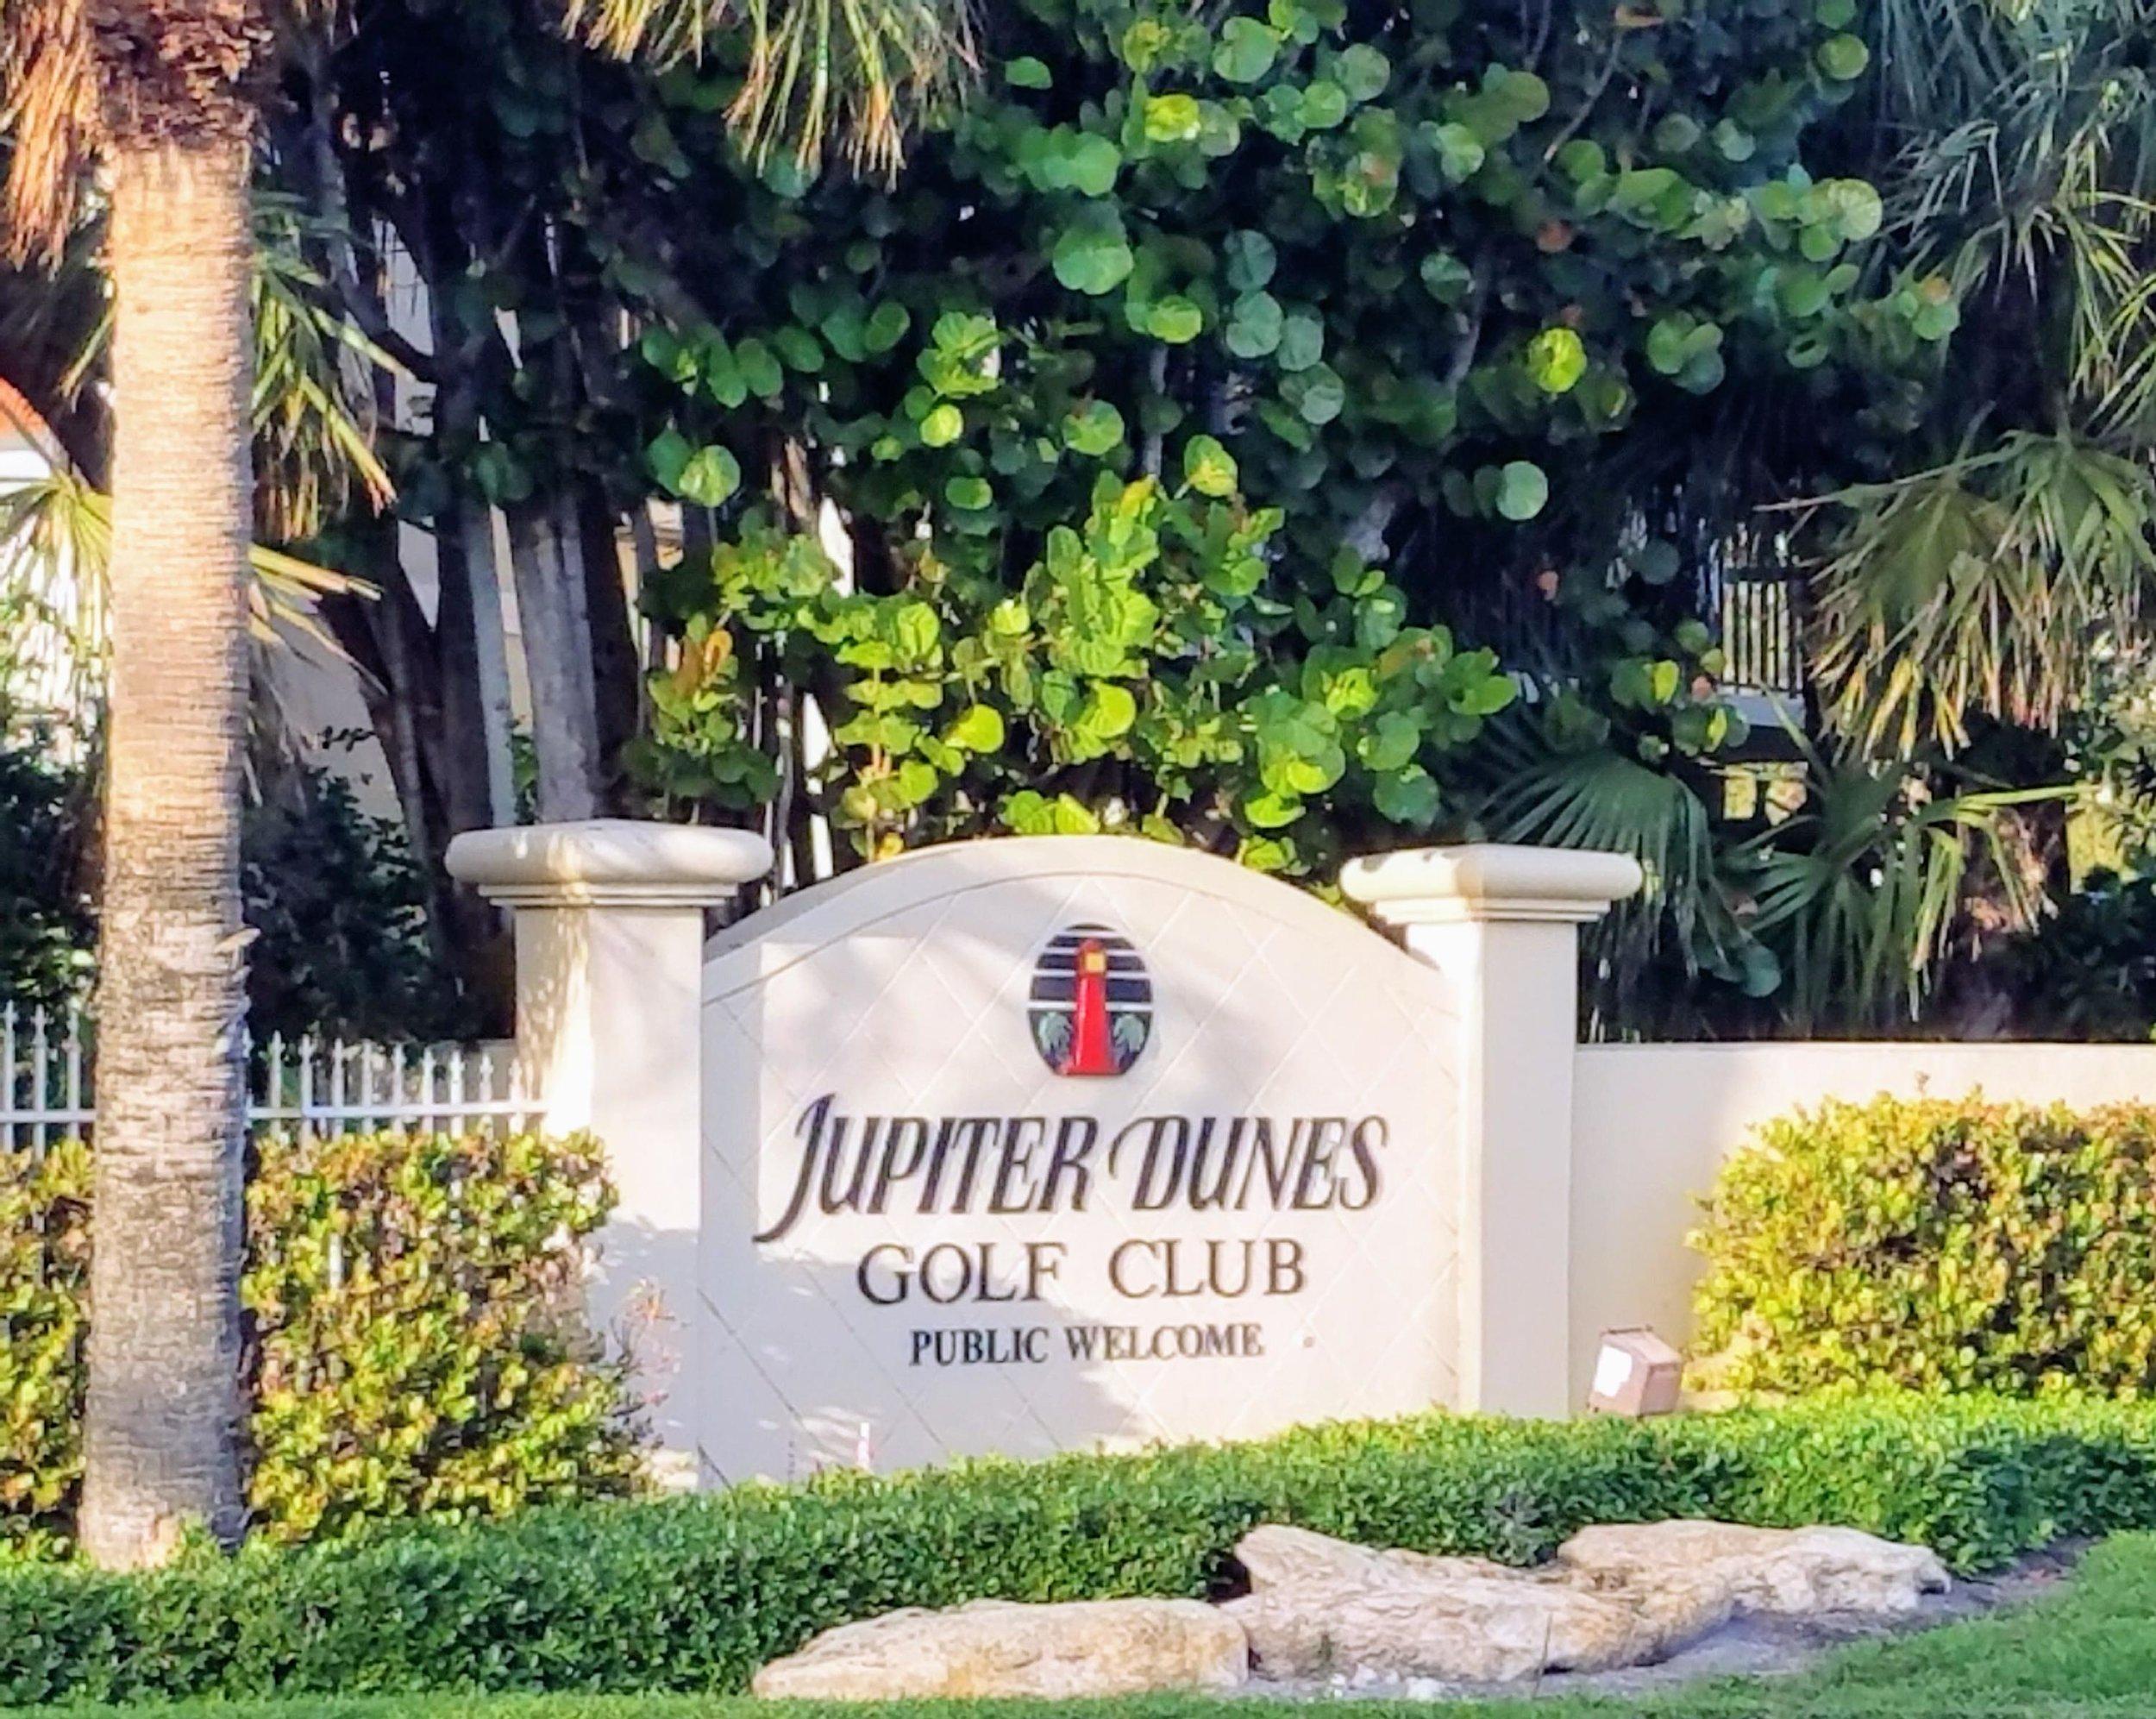 mlre blog jupiter dunes golf club.jpg